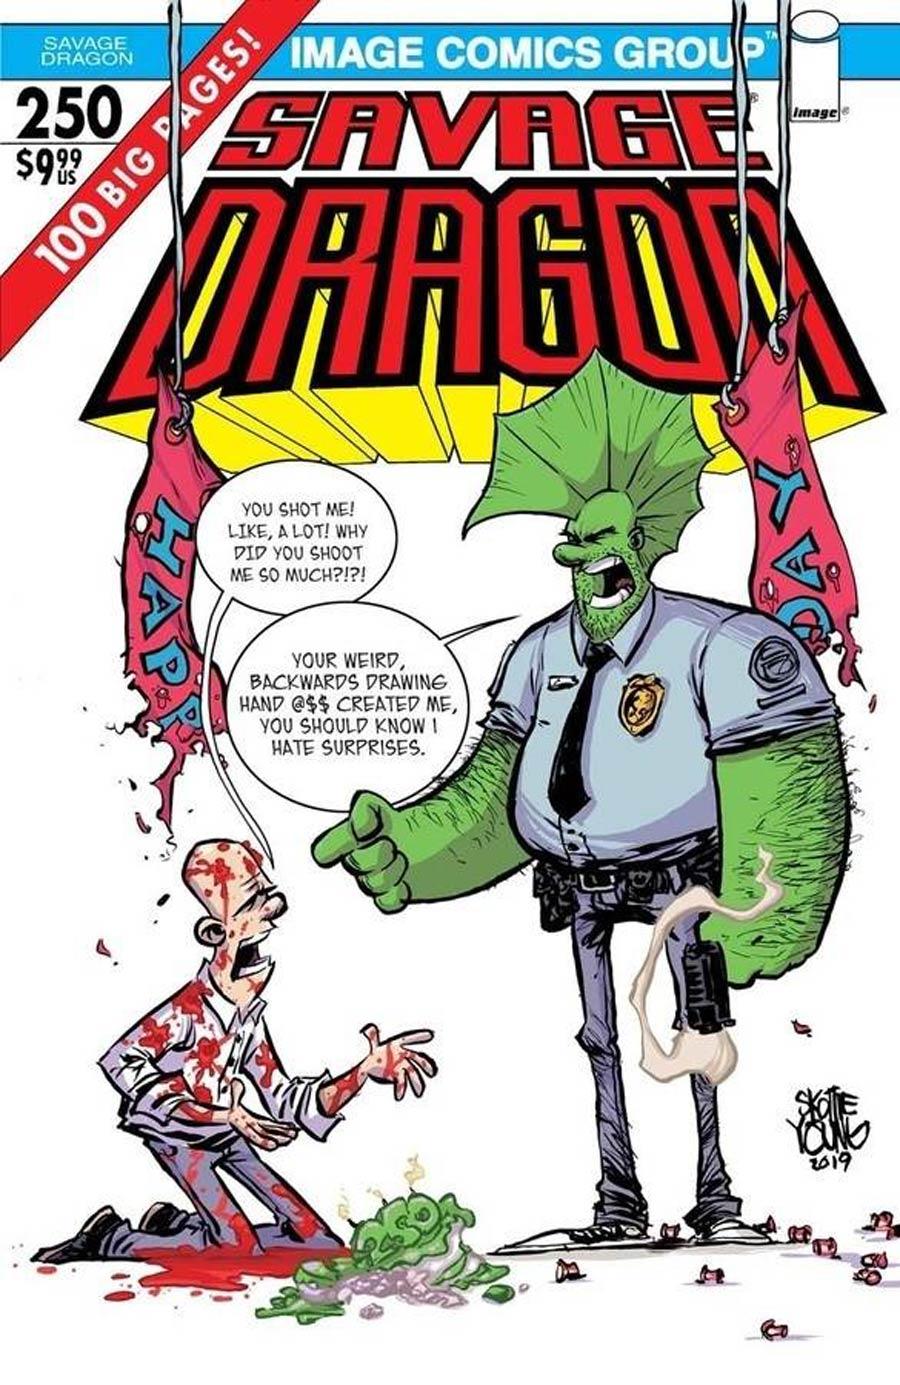 Savage Dragon Vol 2 #250 Cover E Variant Skottie Young Cover